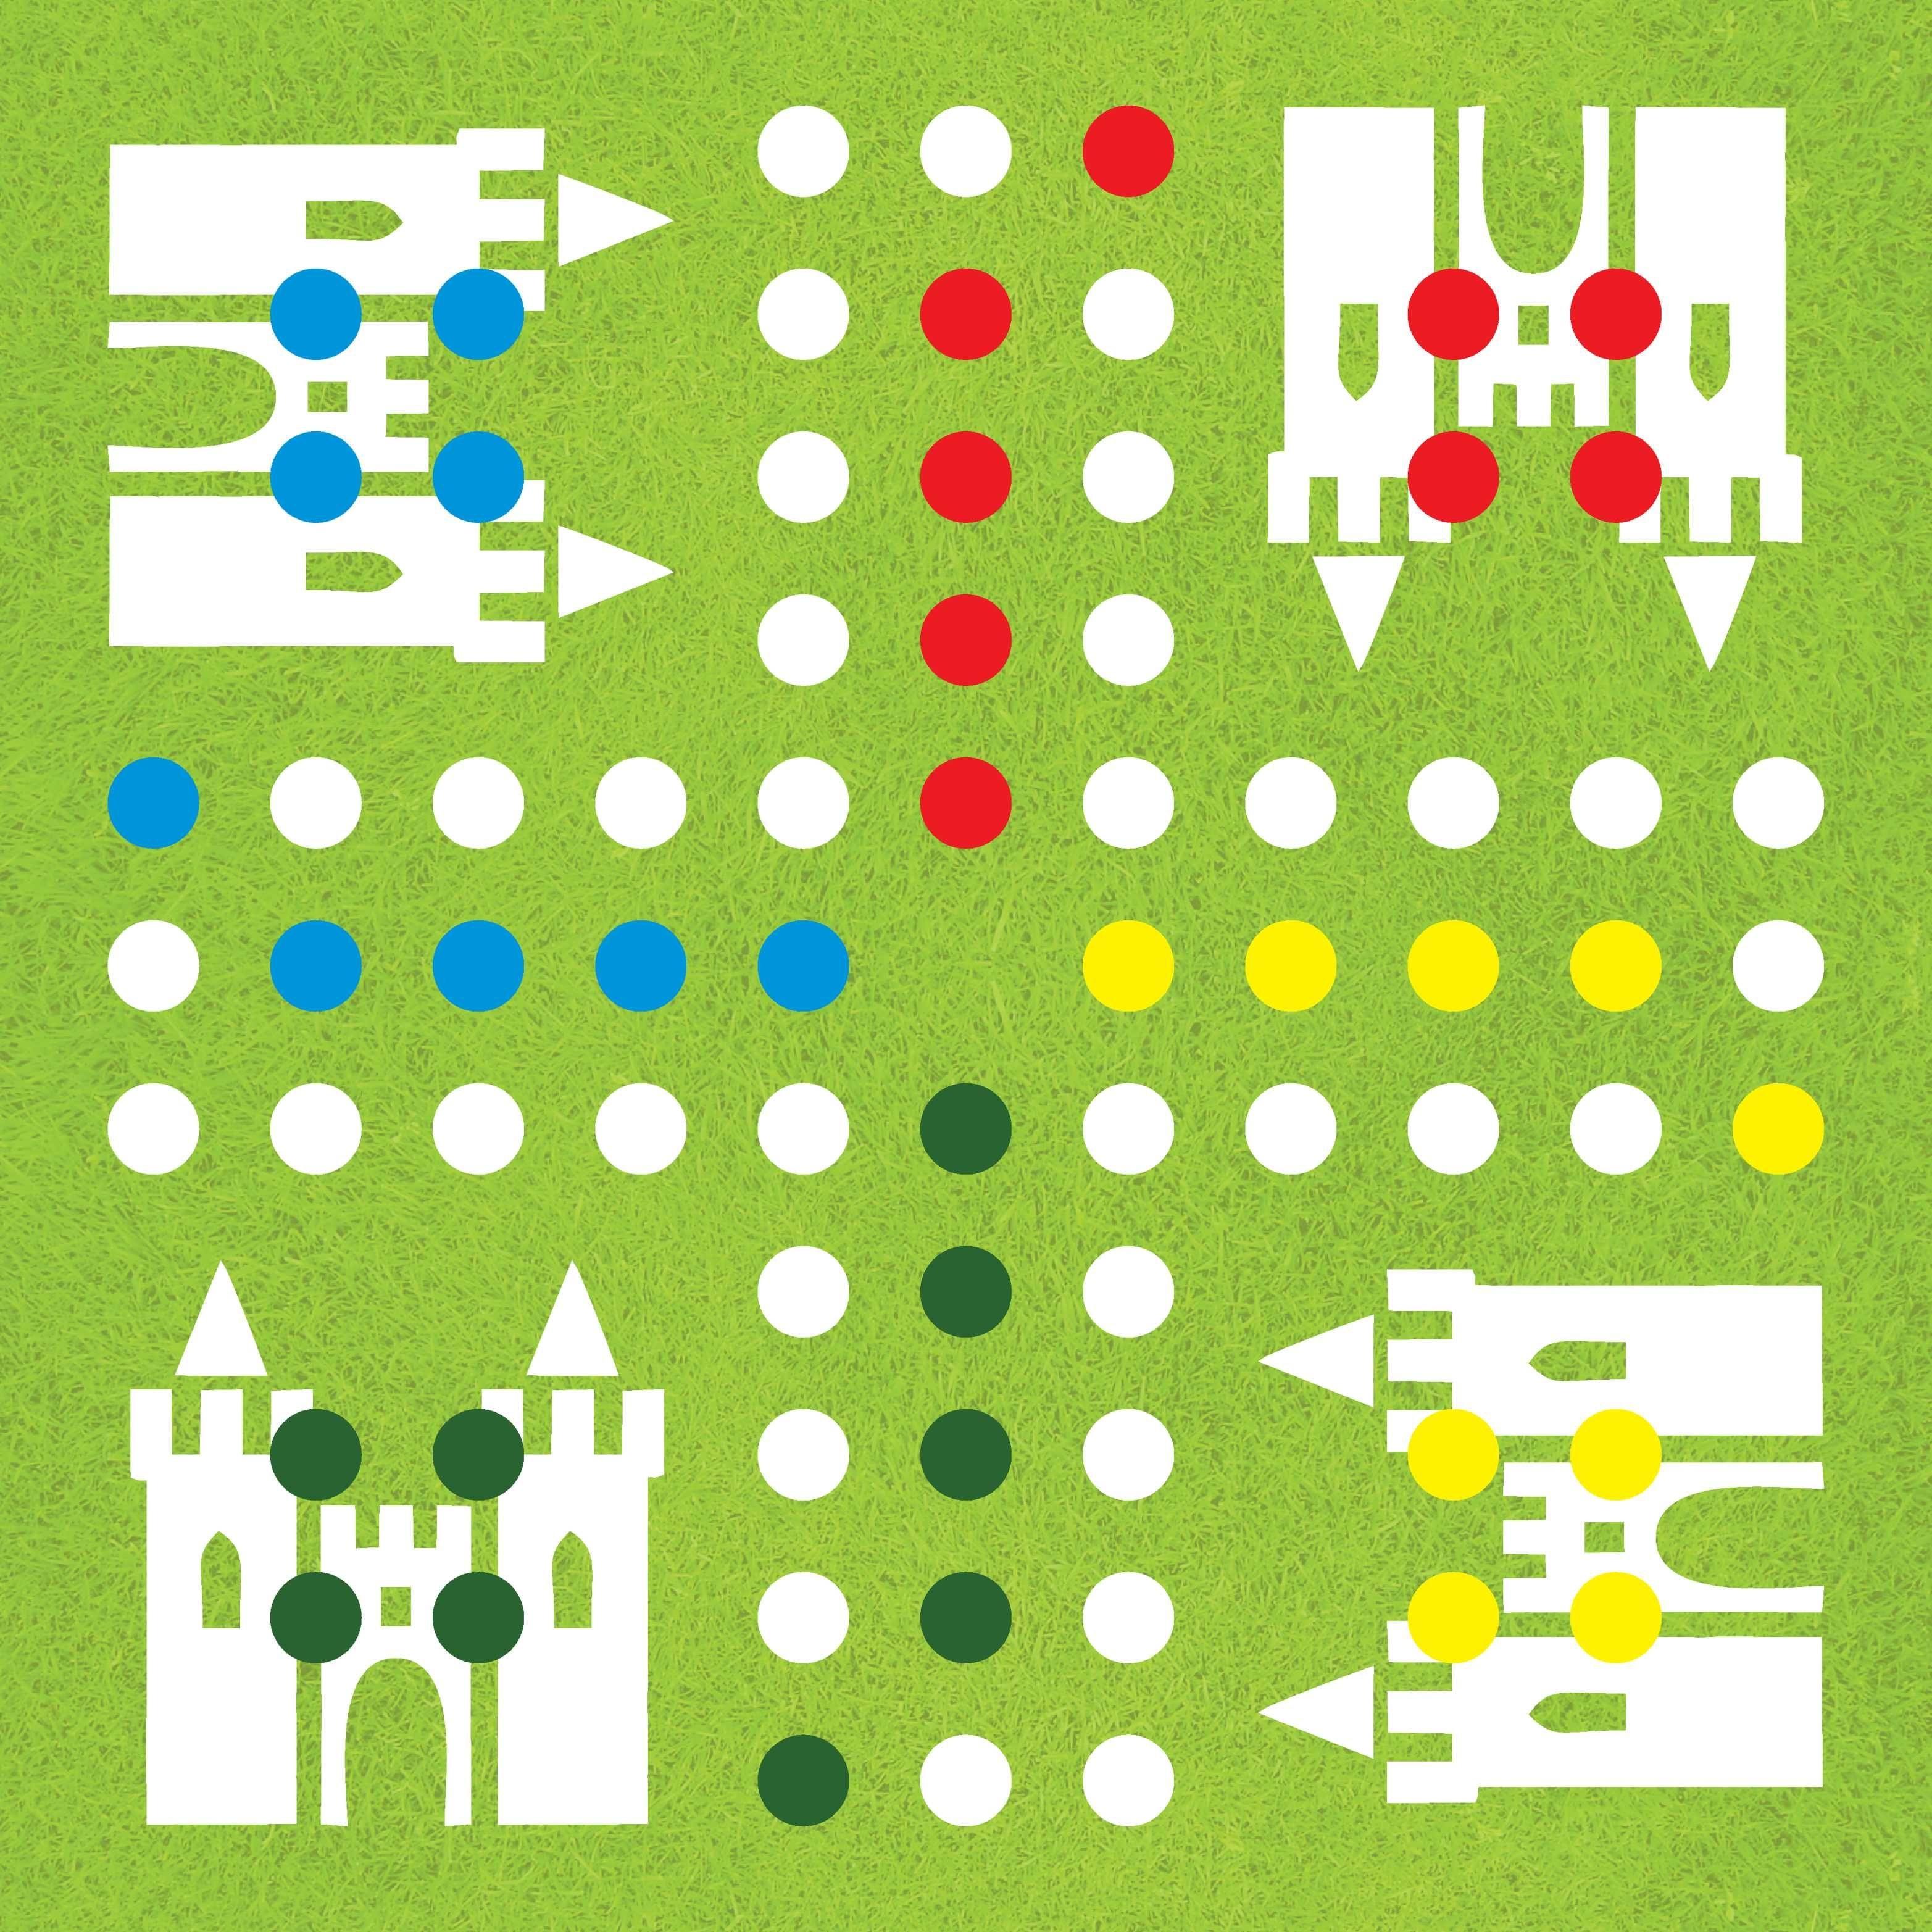 Diy-Ludo-Board-Game-Template - | Board Game | Társasjátékok, Játékok - Free Printable Ludo Board